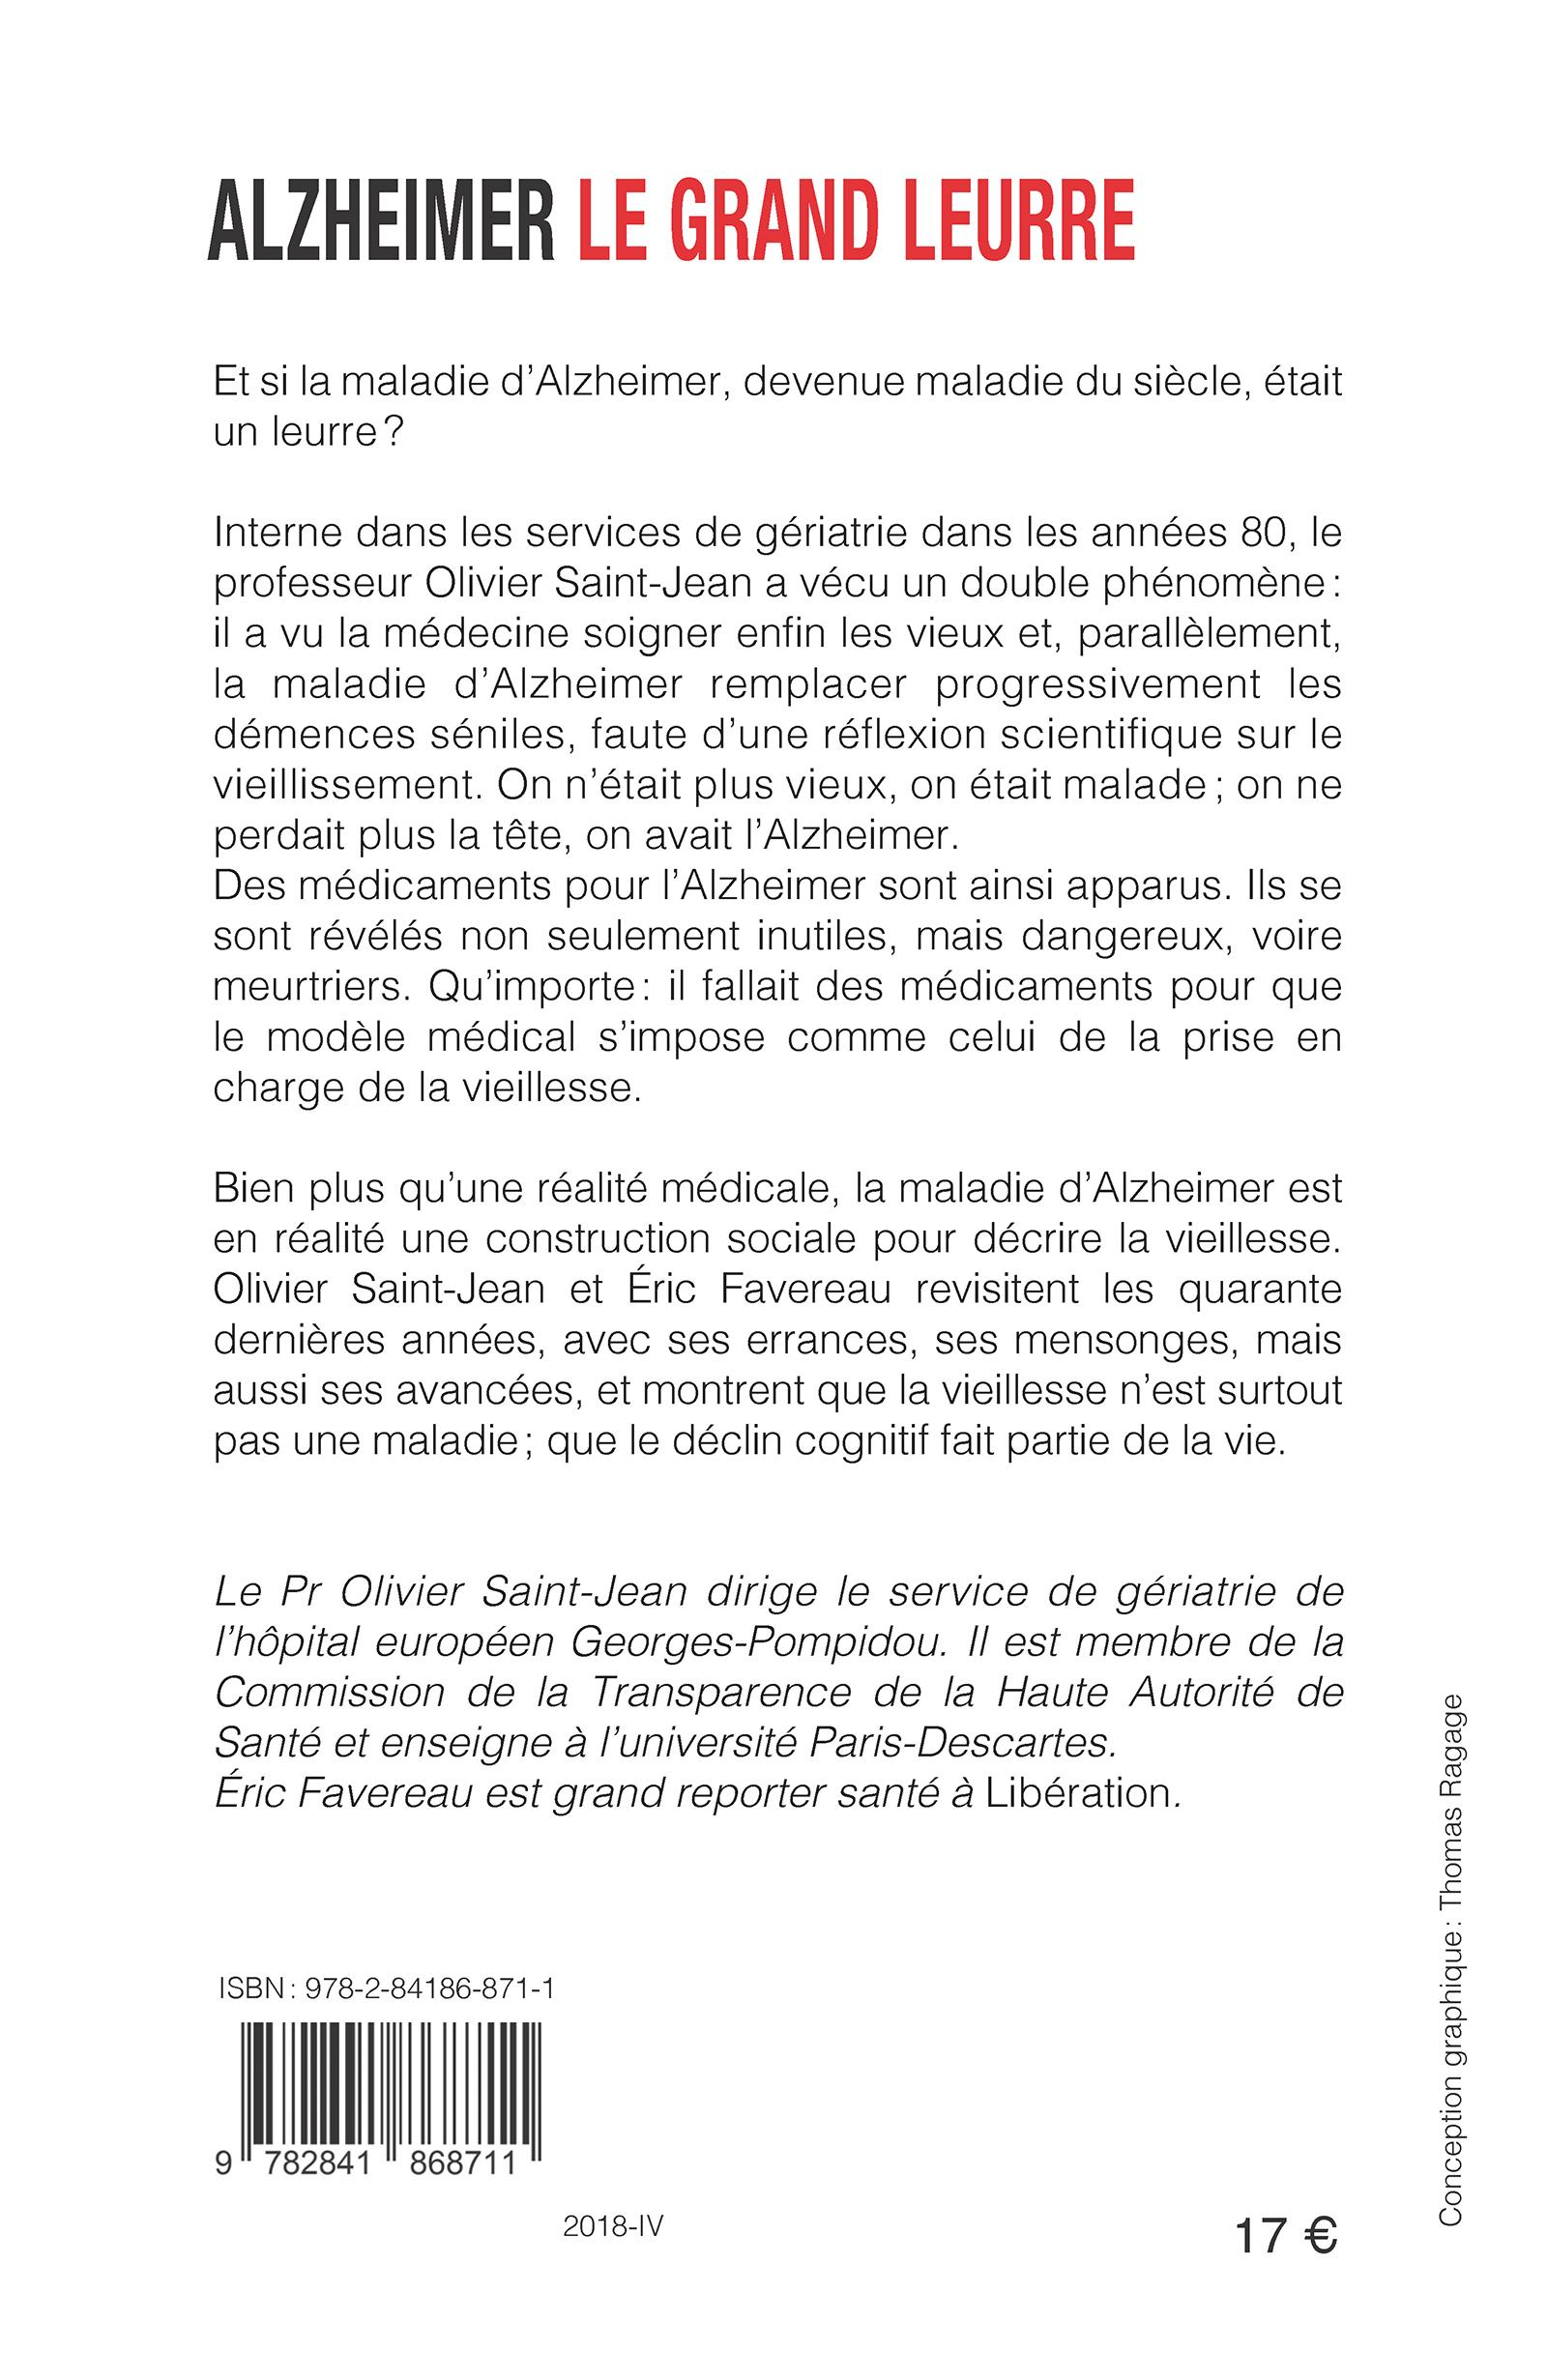 ALZHEIMER, LE GRAND LEURRE, Olivier Saint-Jean, Eric Favereau ...